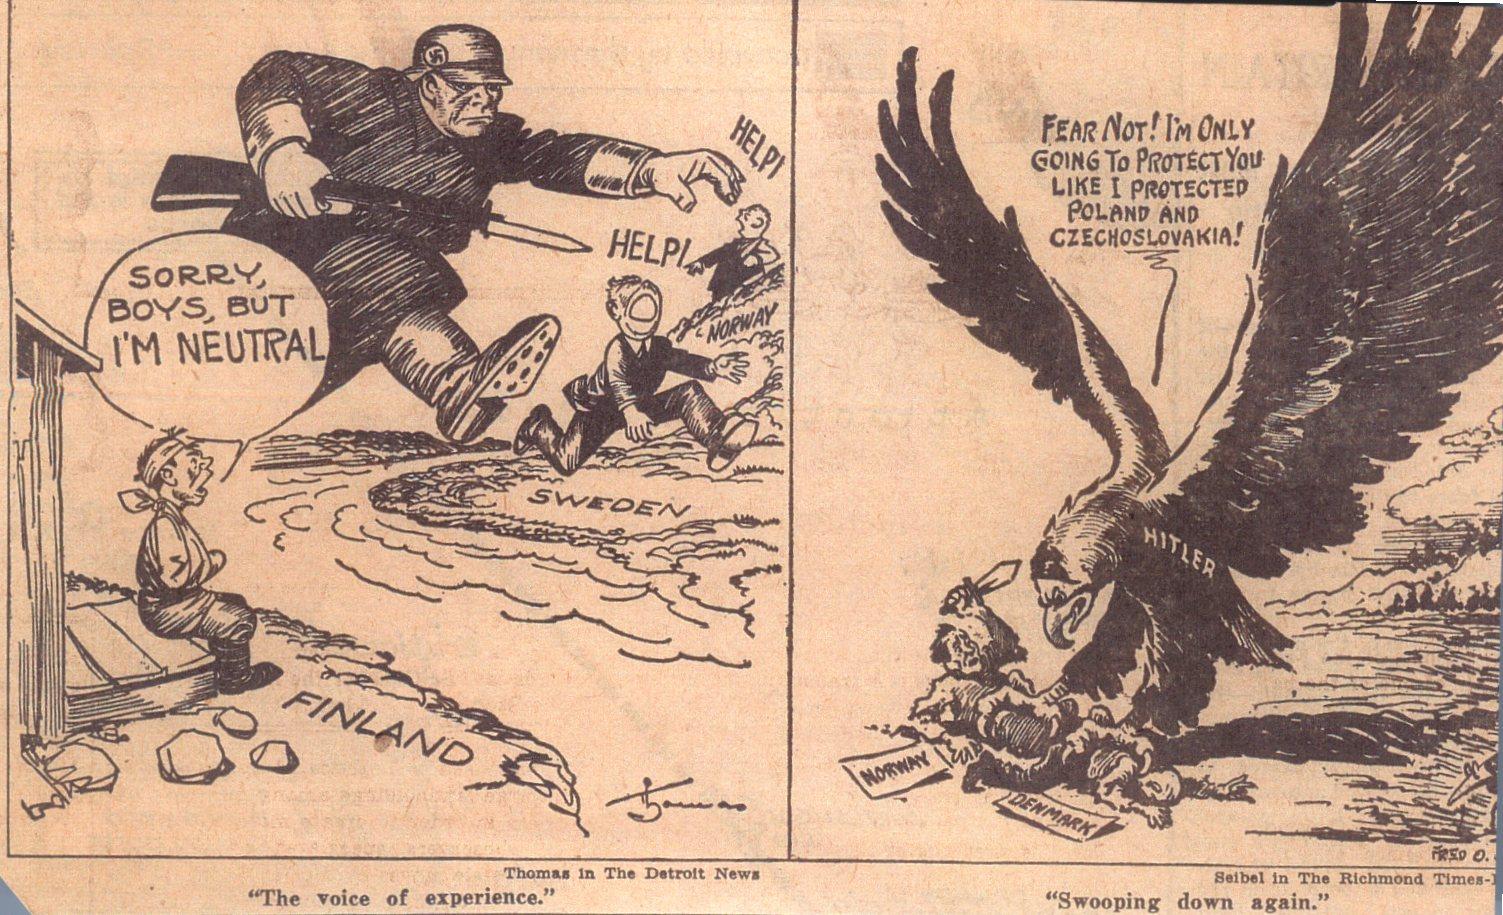 American Politics in World War 2?